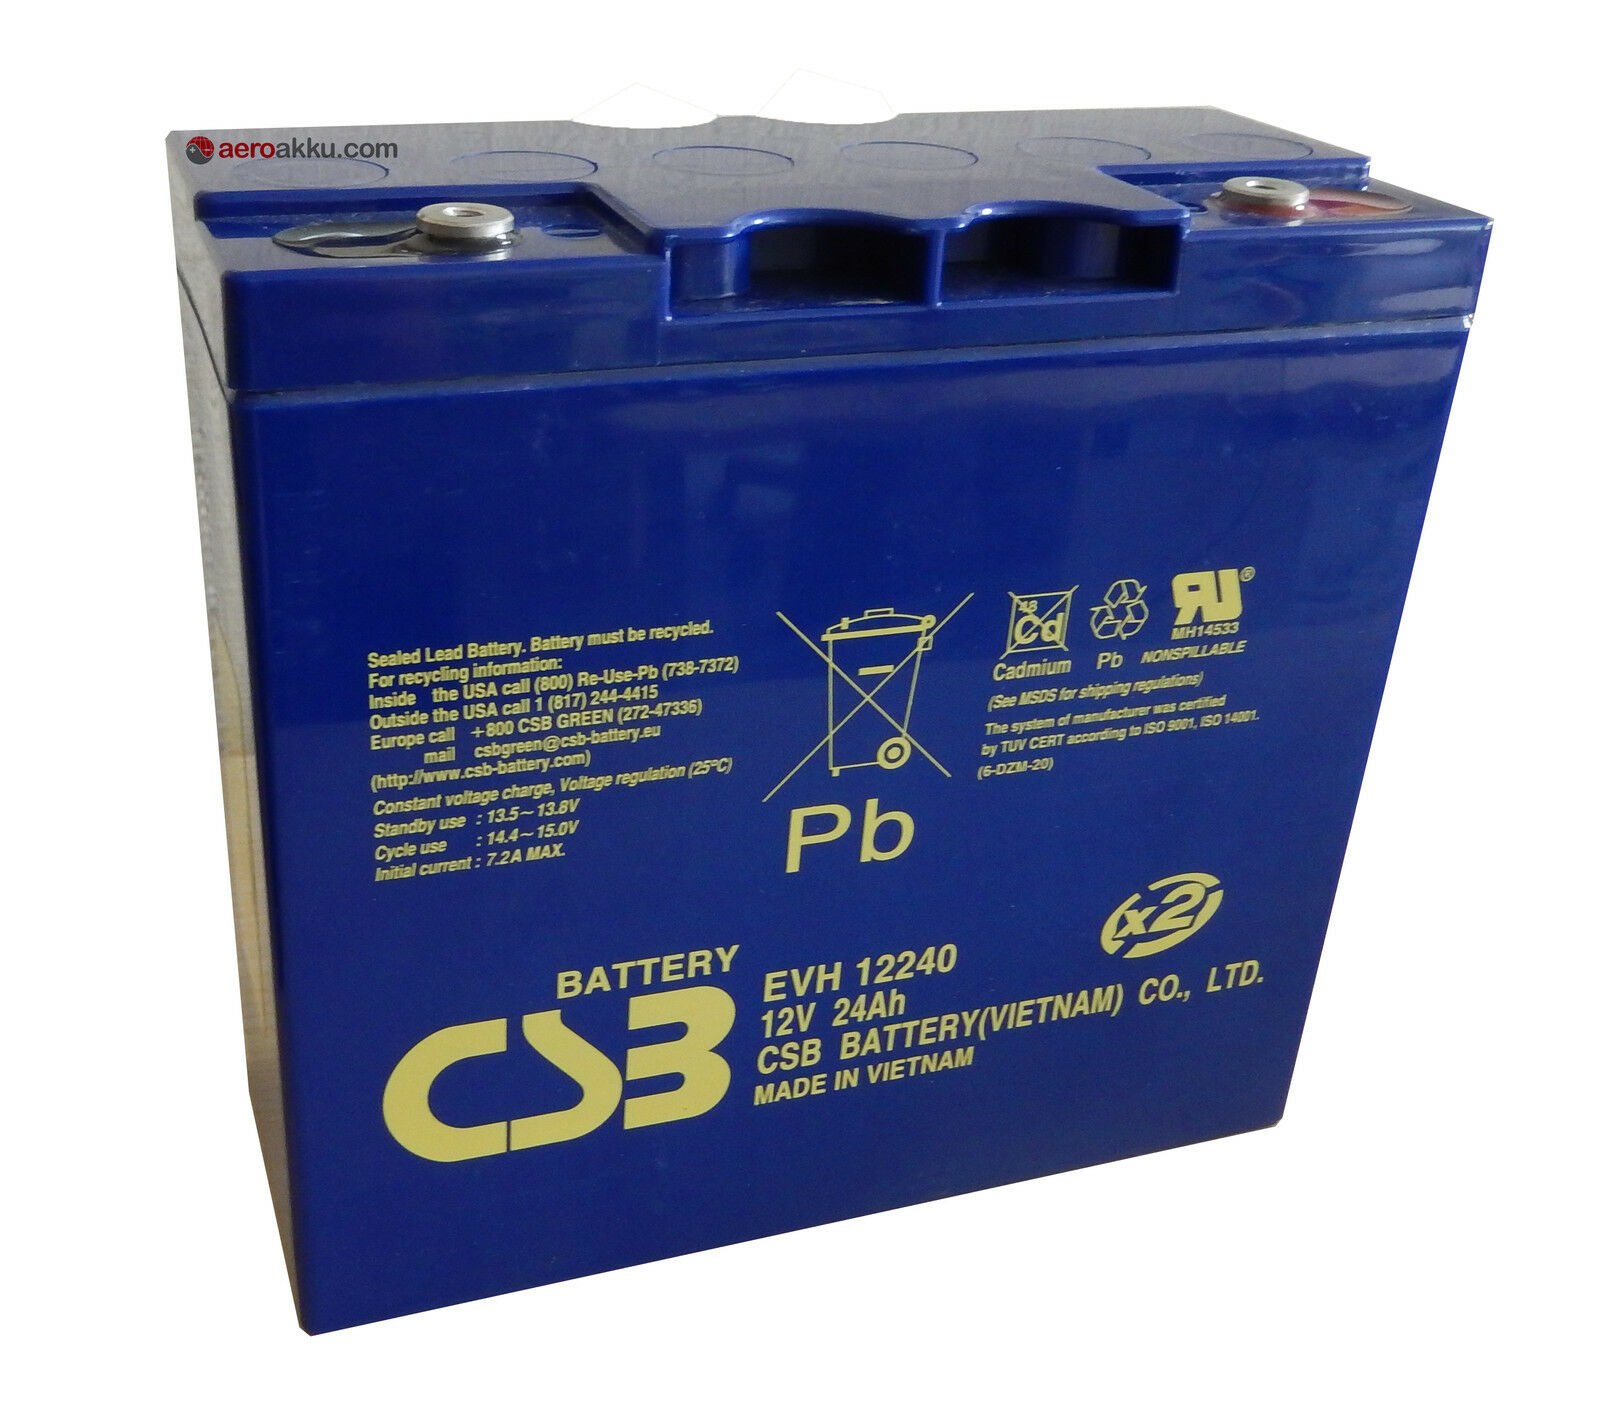 PC680 Hitachi CSB EVH 12240 AGM Akku 12V 24Ah Odyssey wie Odyssey 24Ah PC680 Genesis 12EP16 611619